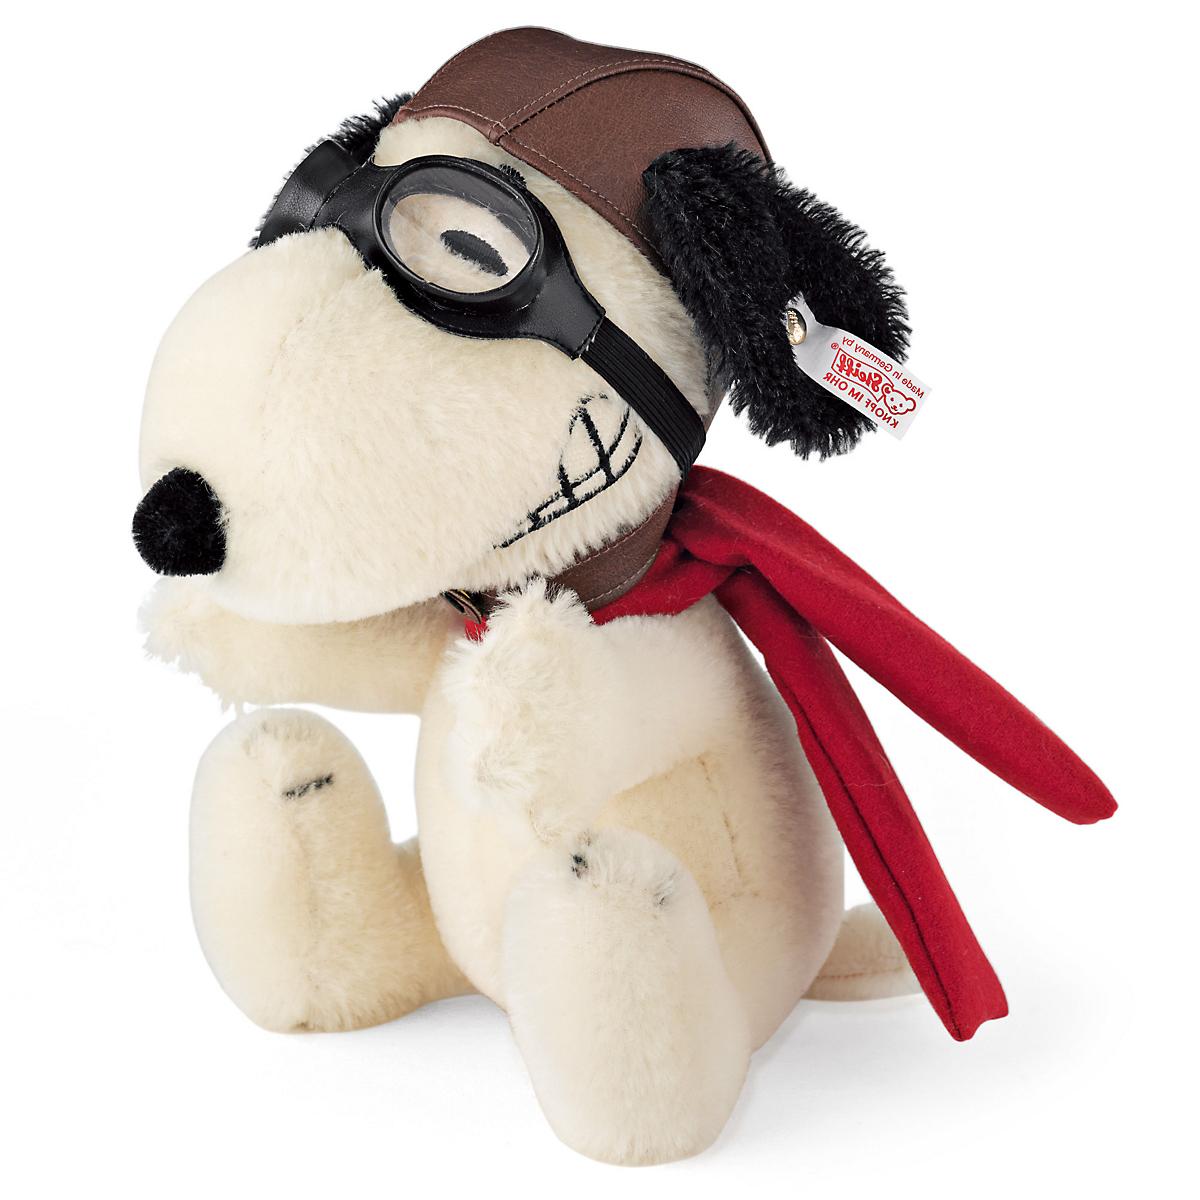 Steiff Pilot Snoopy Gump S